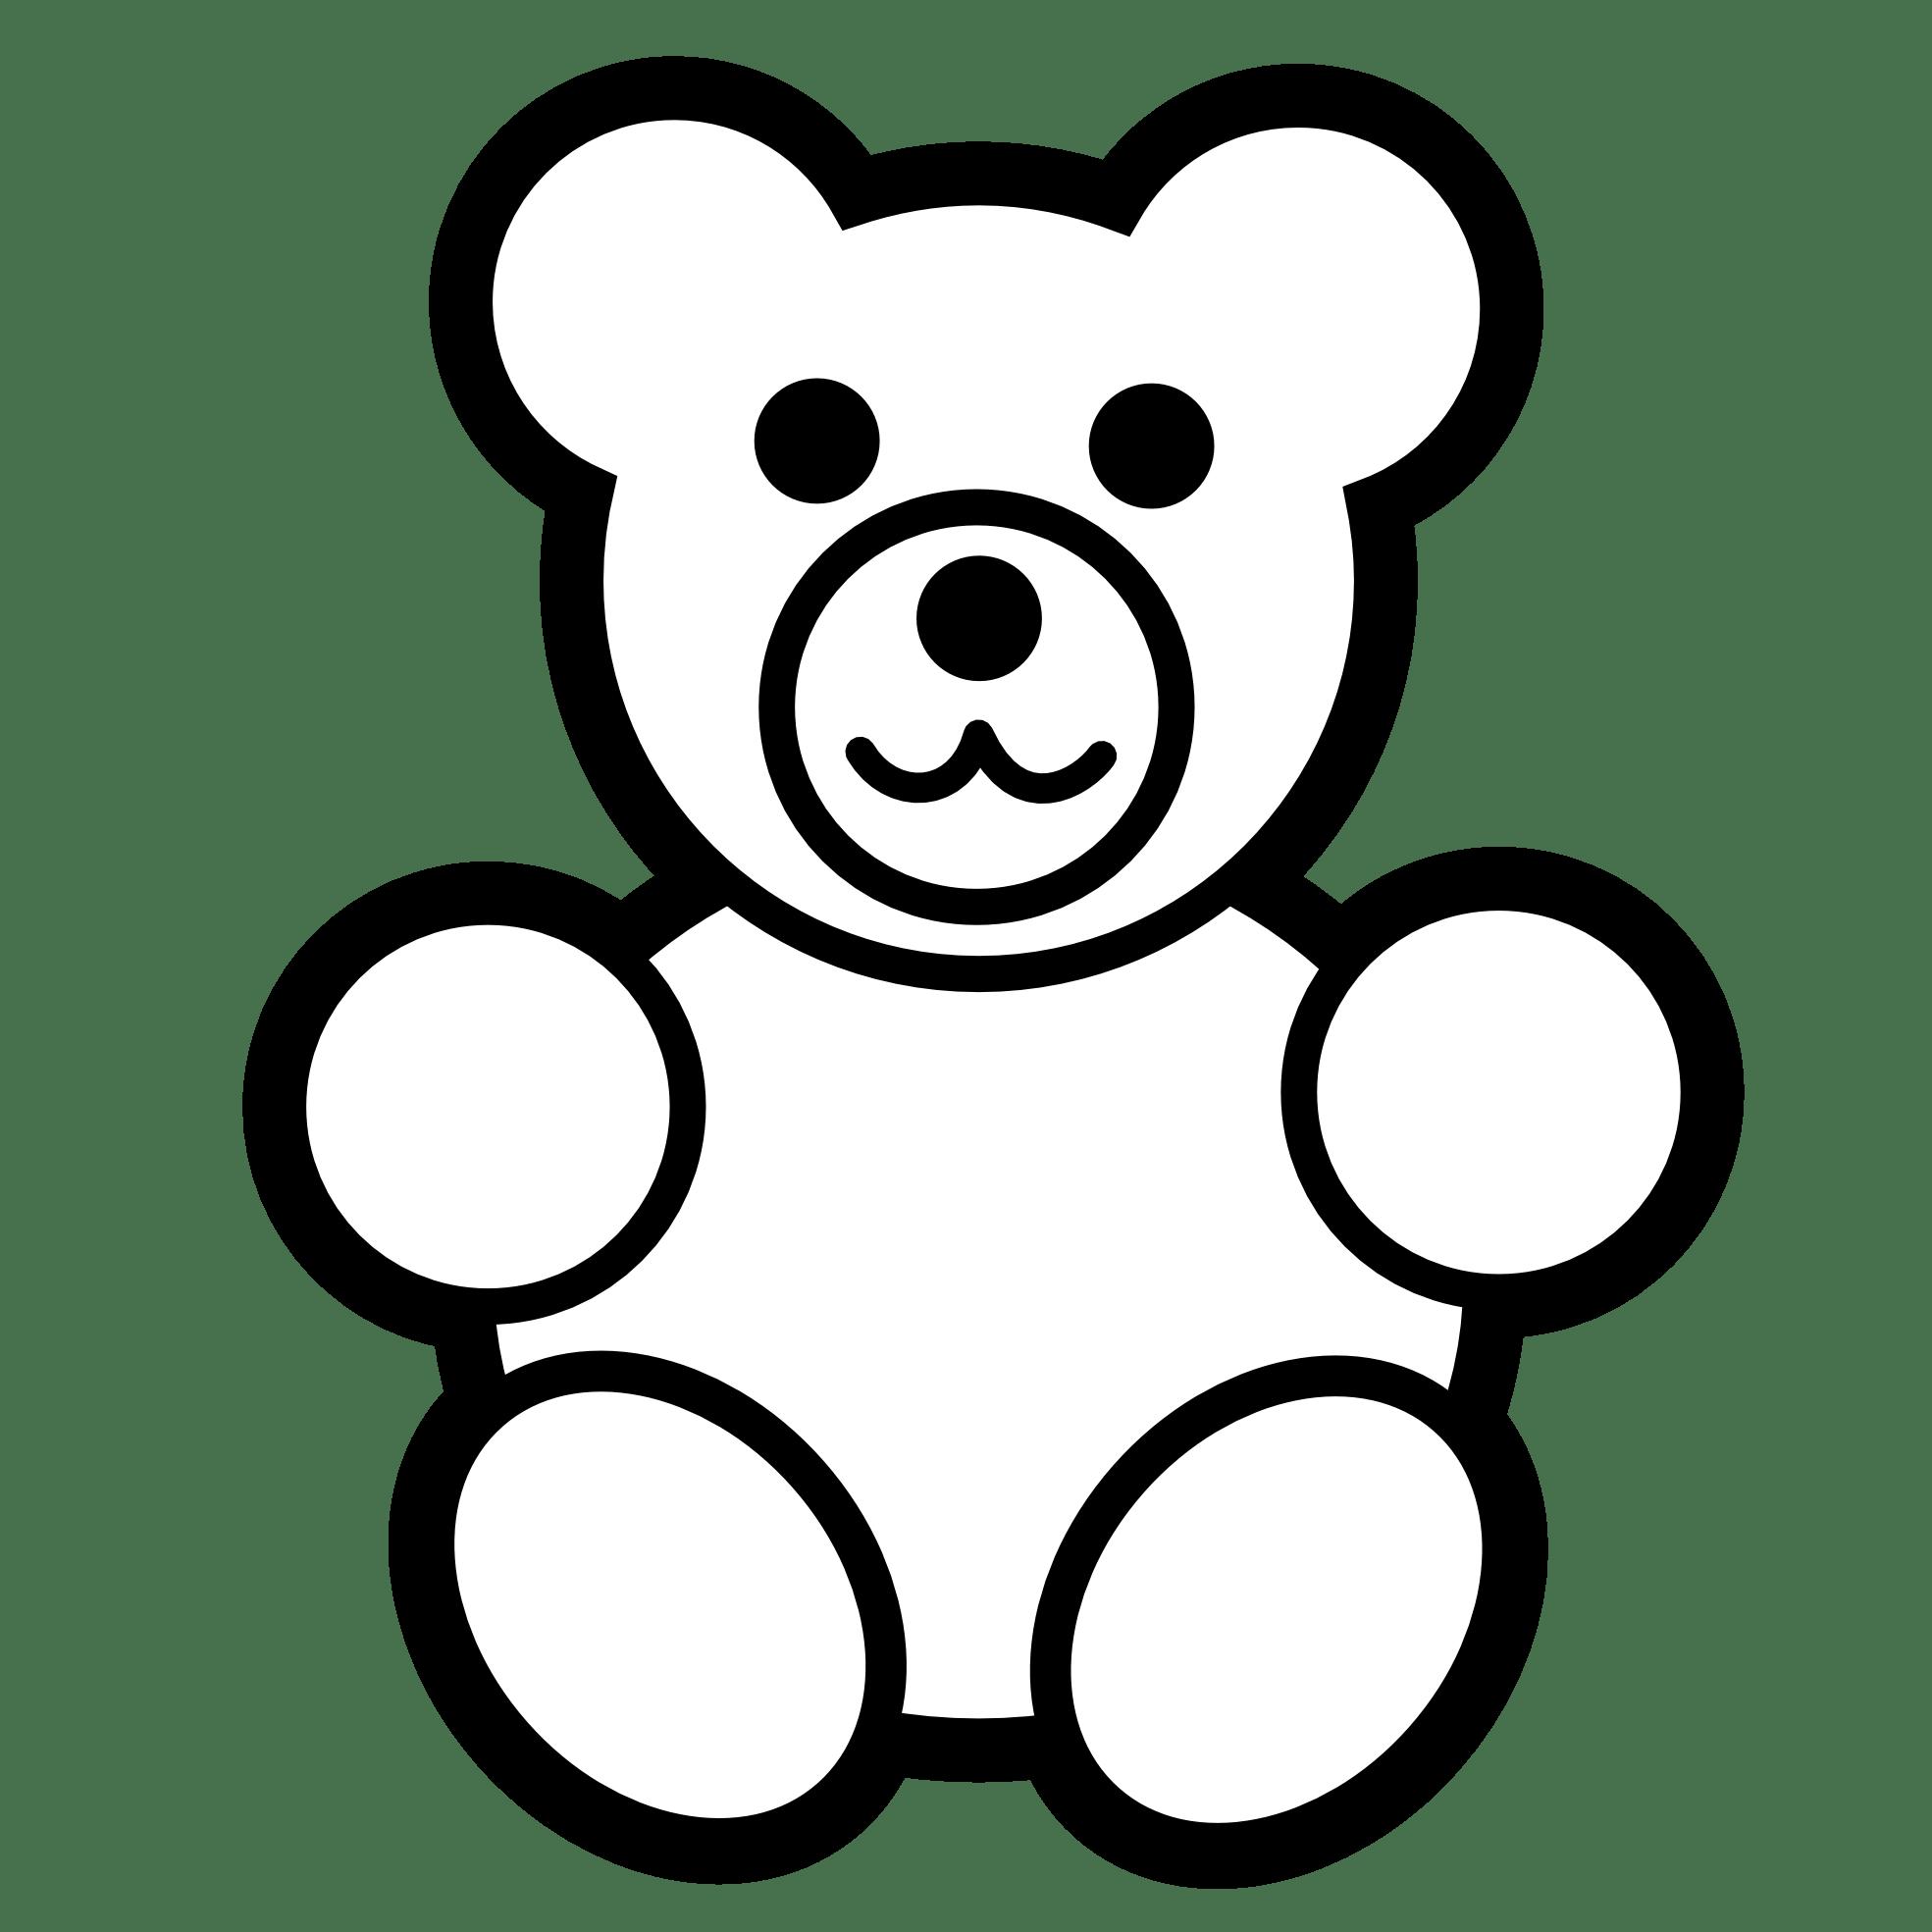 Teddy Bear Clipart Black And White Clipart Panda